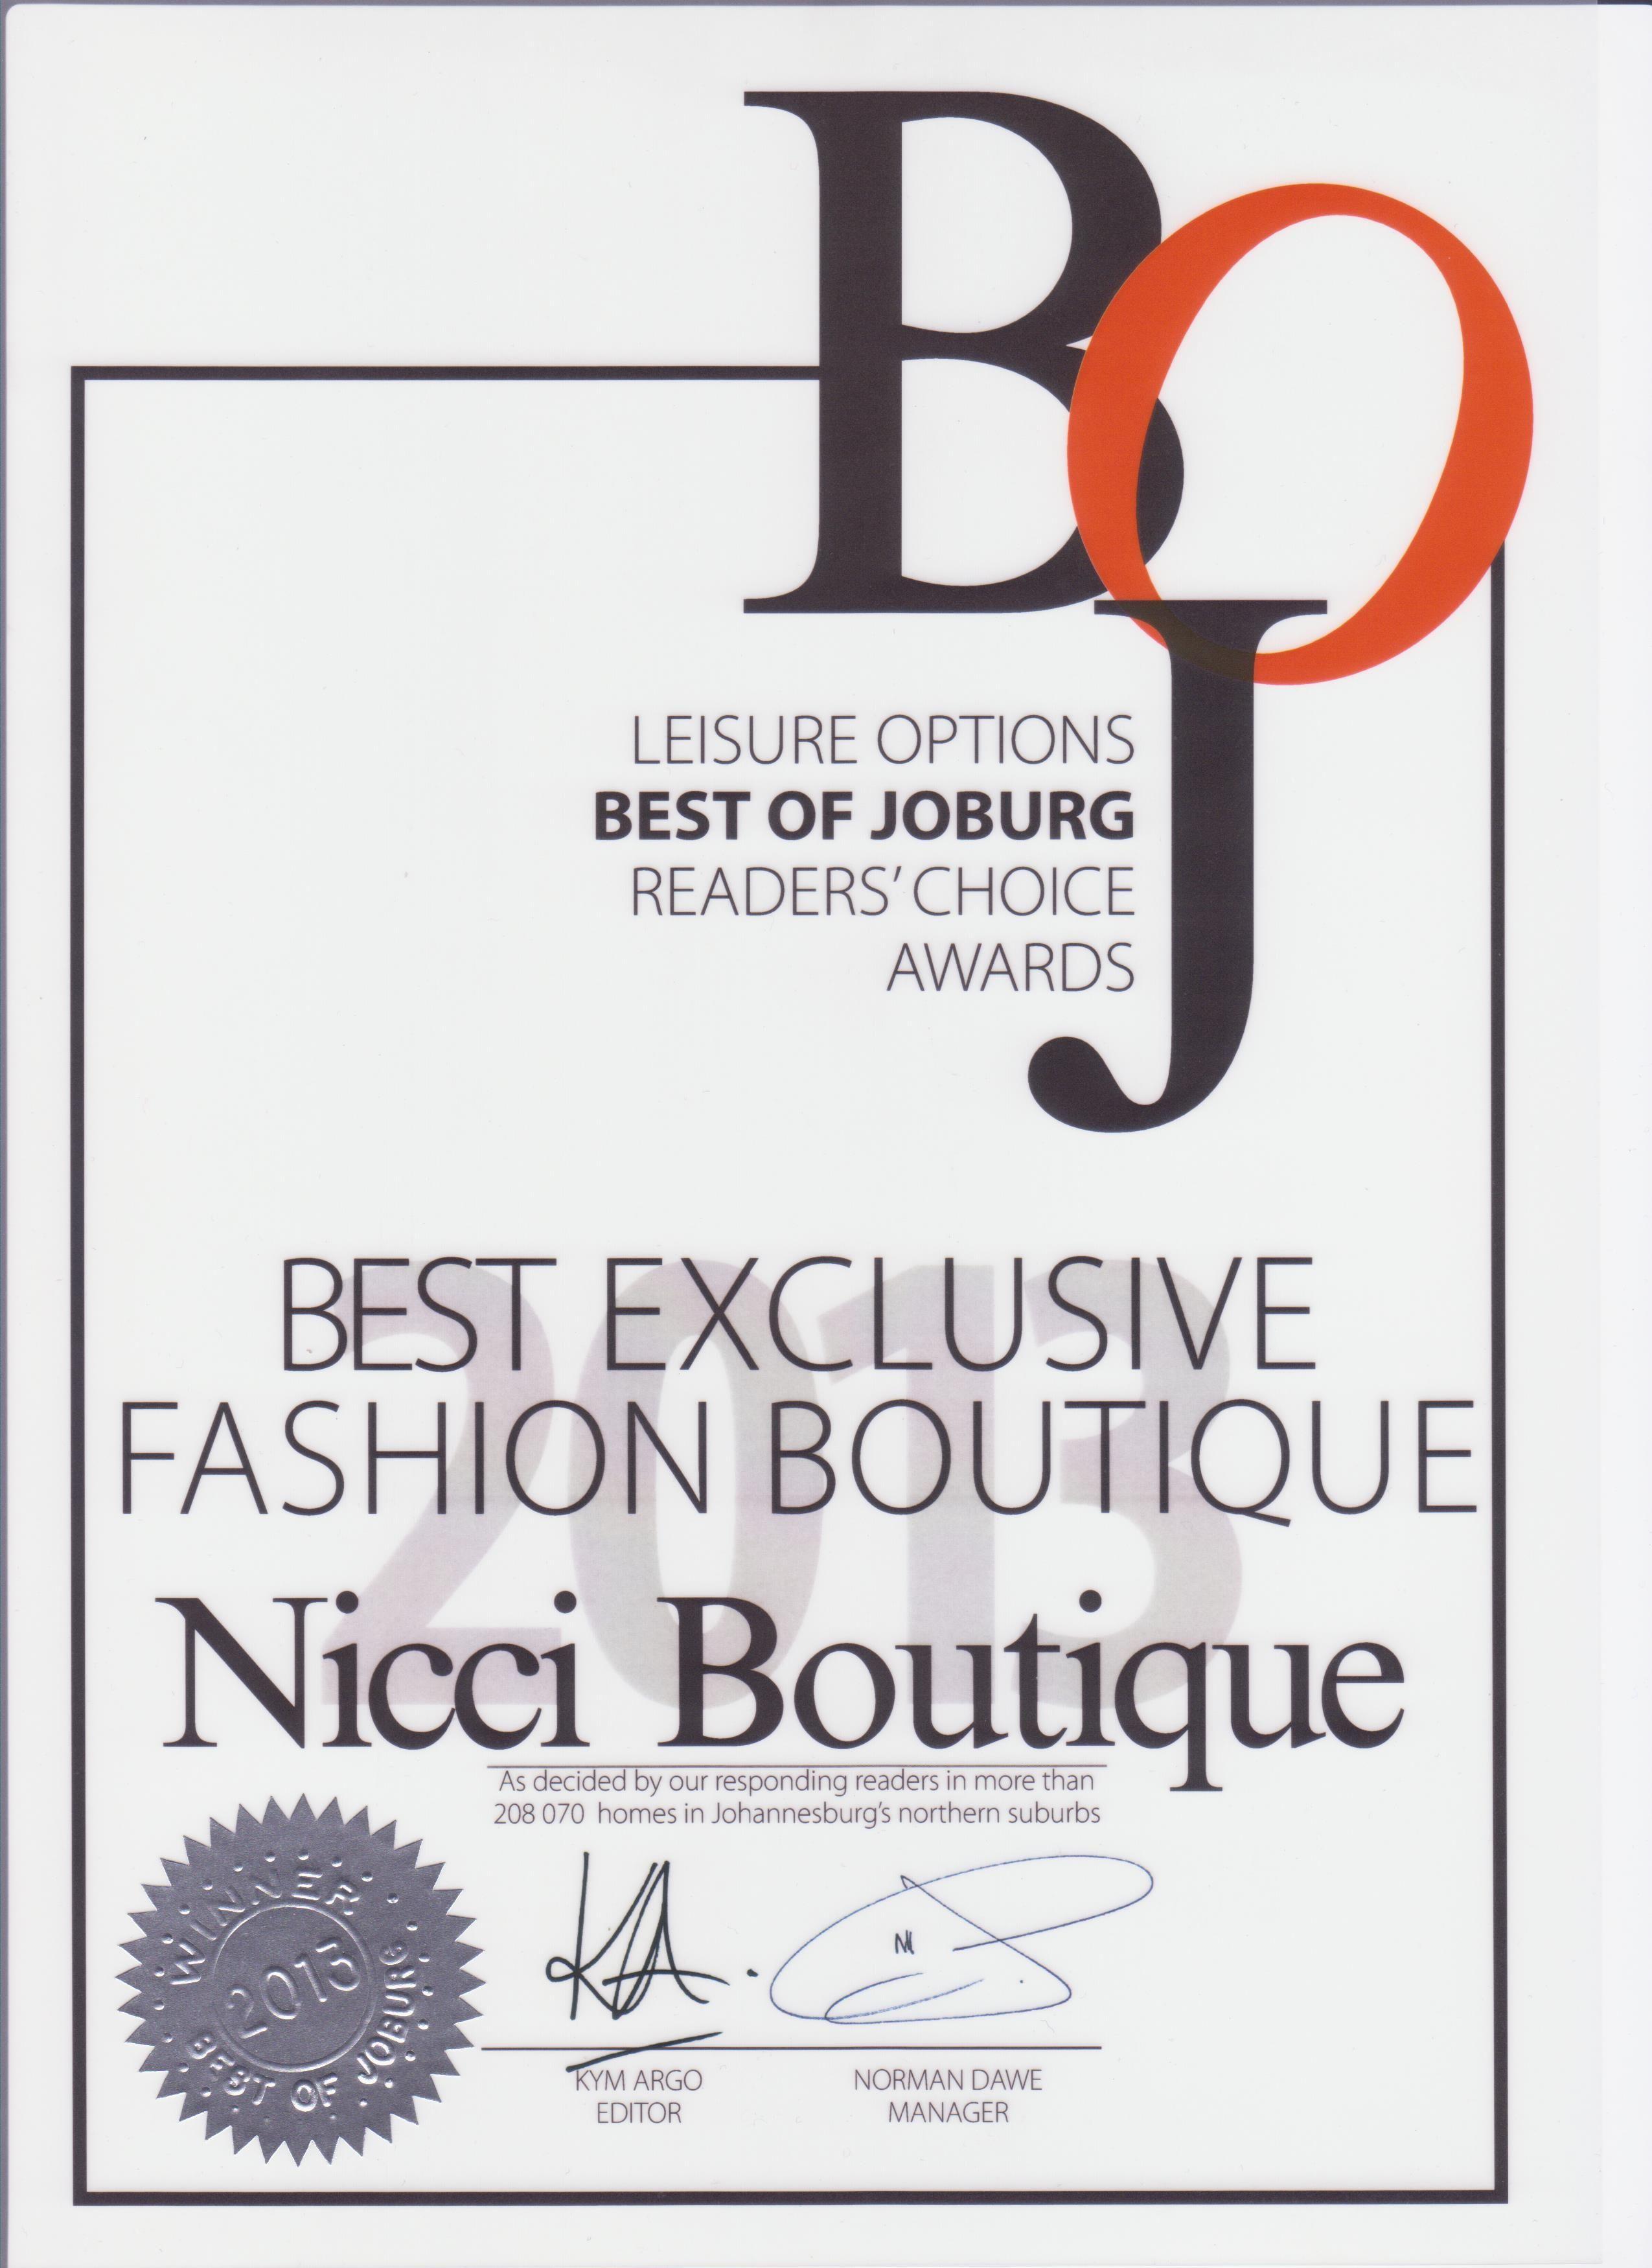 #BestOfJoburg #BestBoutique 2013